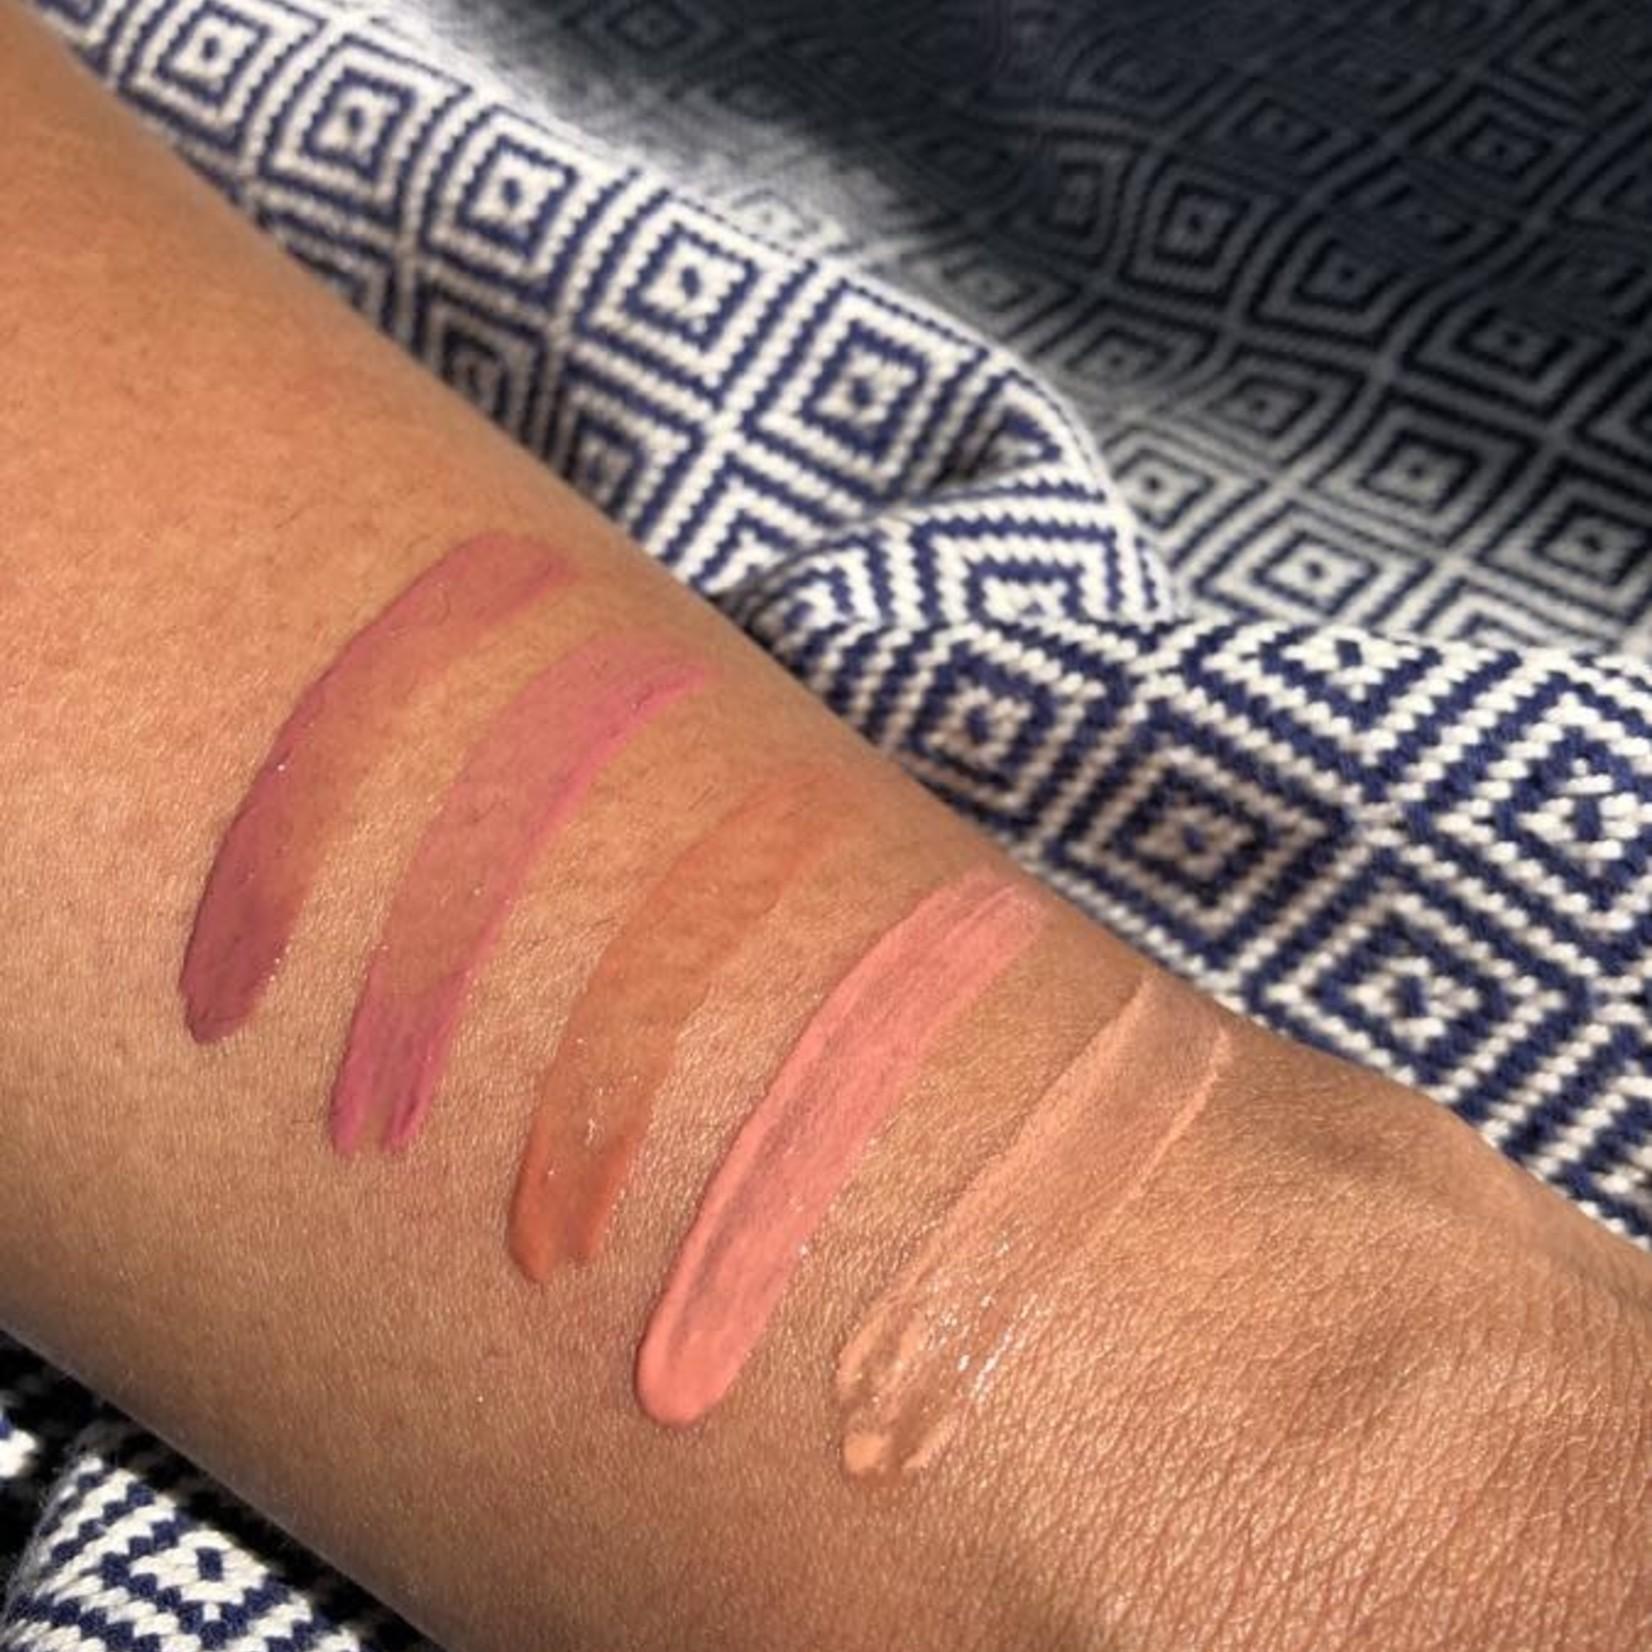 Dalish Dalish Lipgloss - G05 Dark Berry